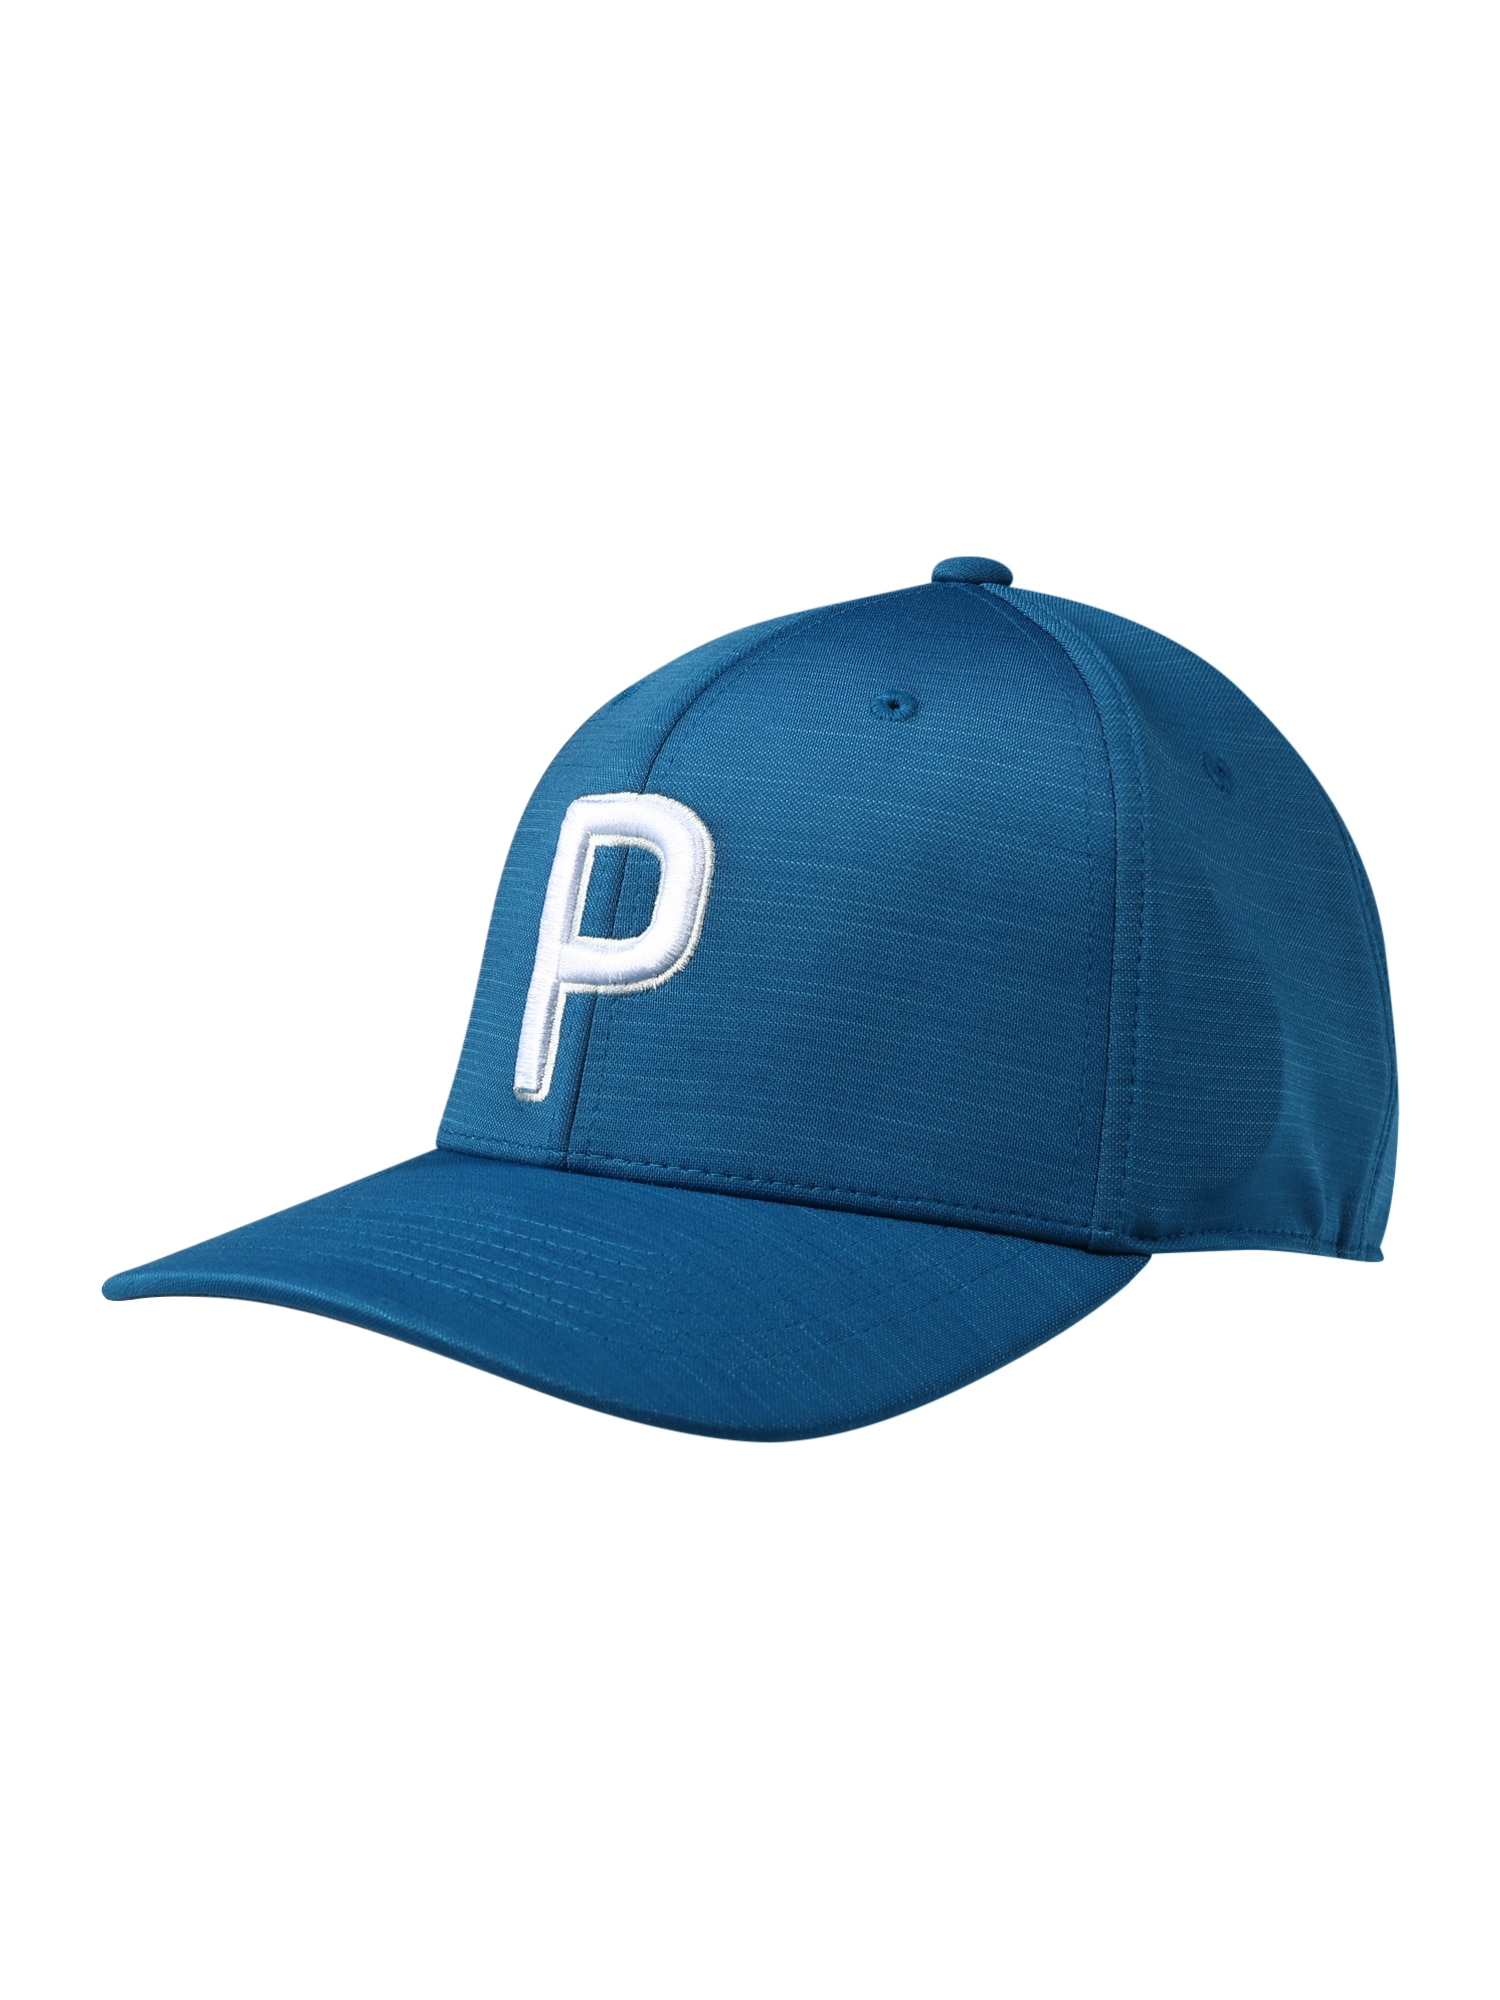 PUMA Sportinė kepurė mėlyna / balta